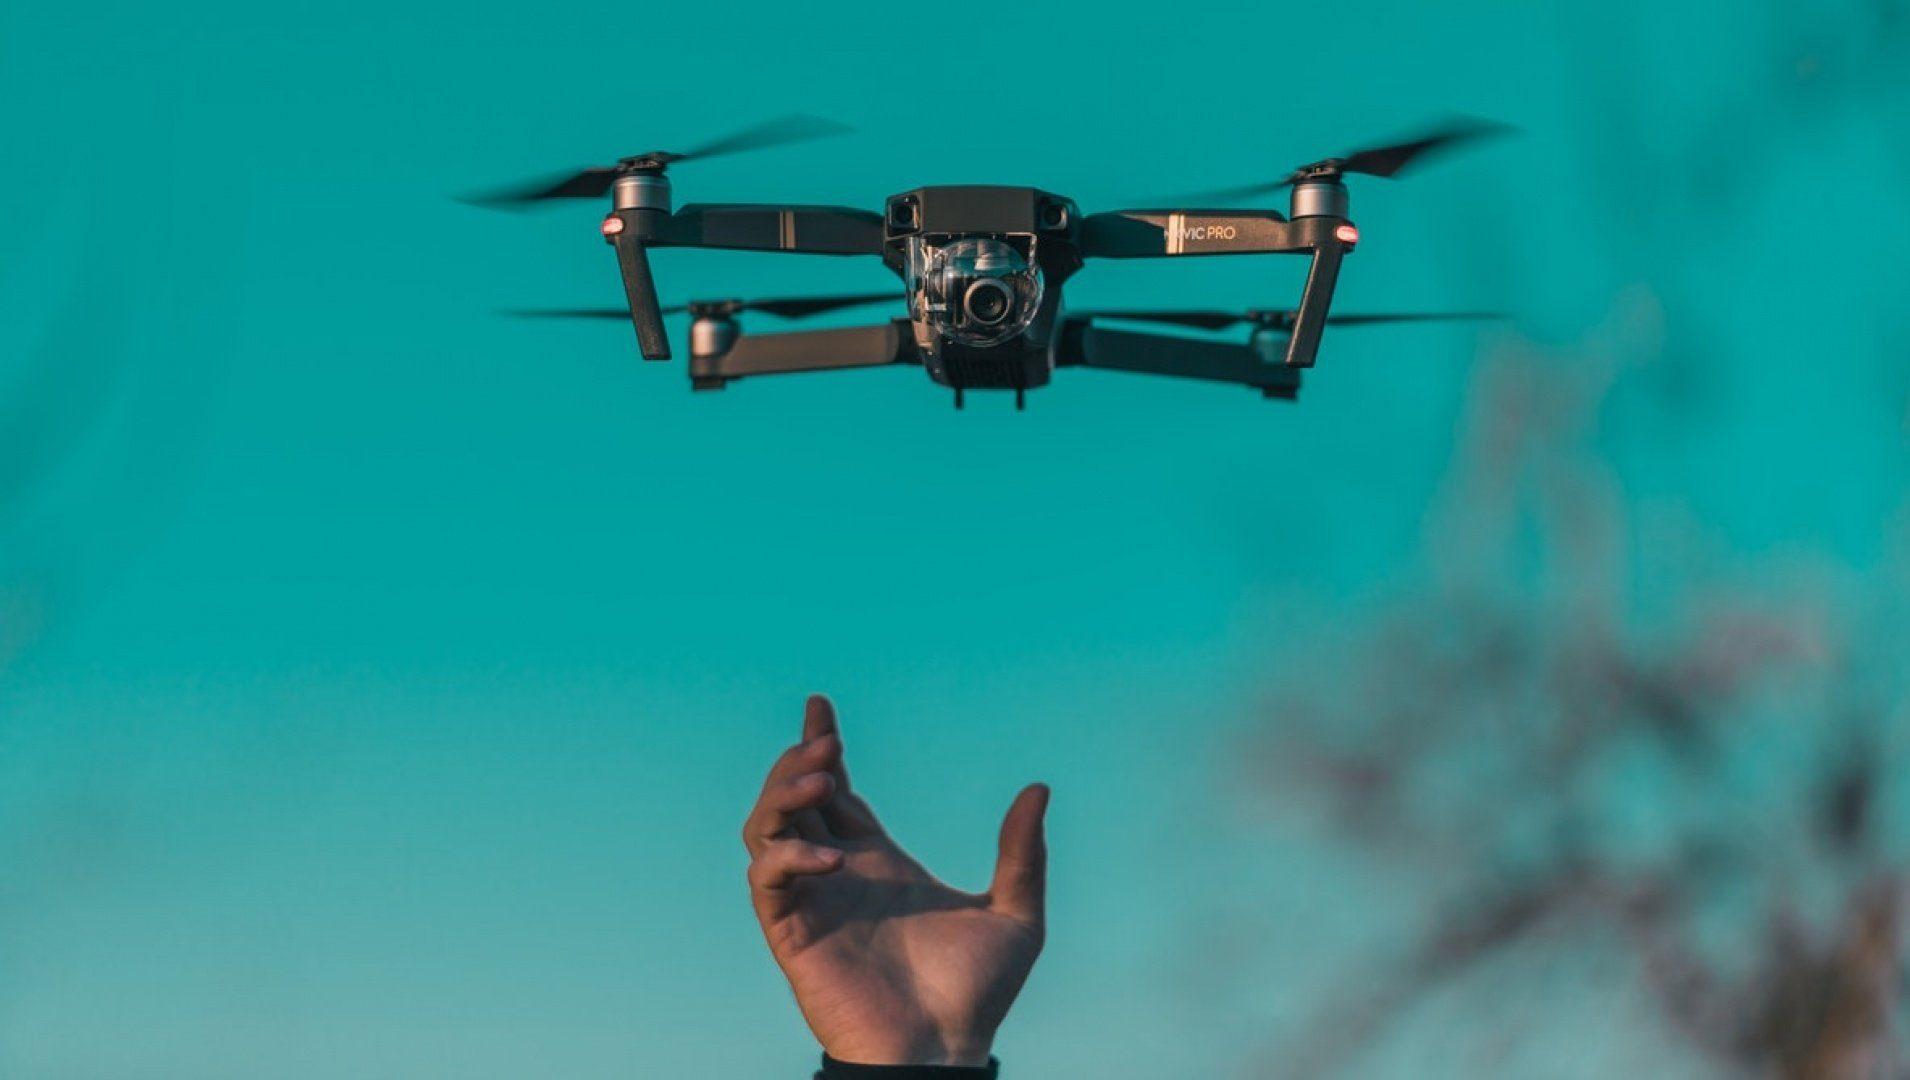 THALES drone